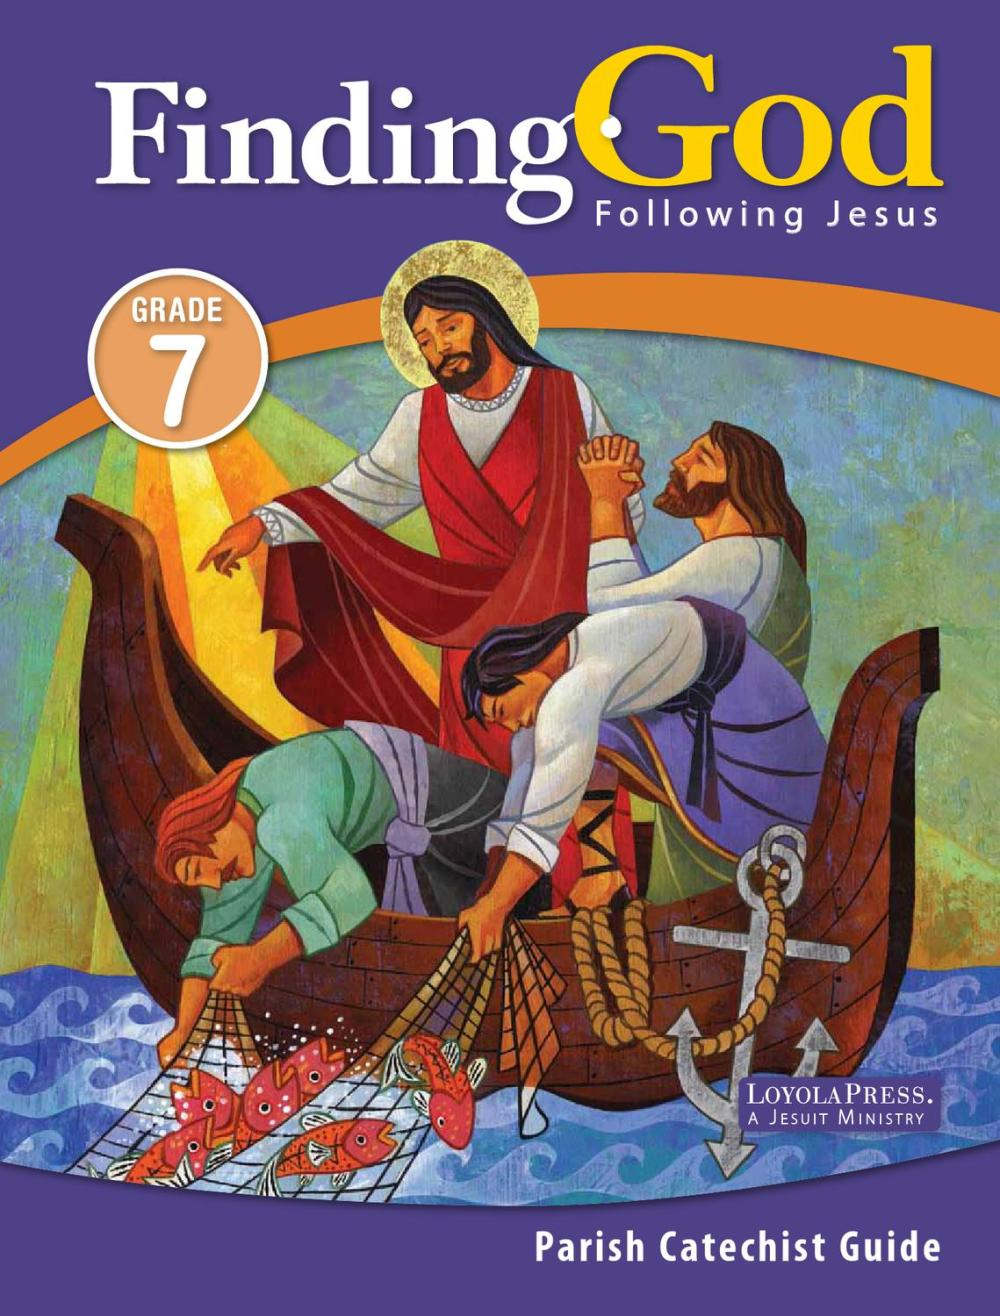 medium resolution of Finding God 2013 Grade 7 Parish Catechist Guide   PART 1 by Loyola Press -  issuu